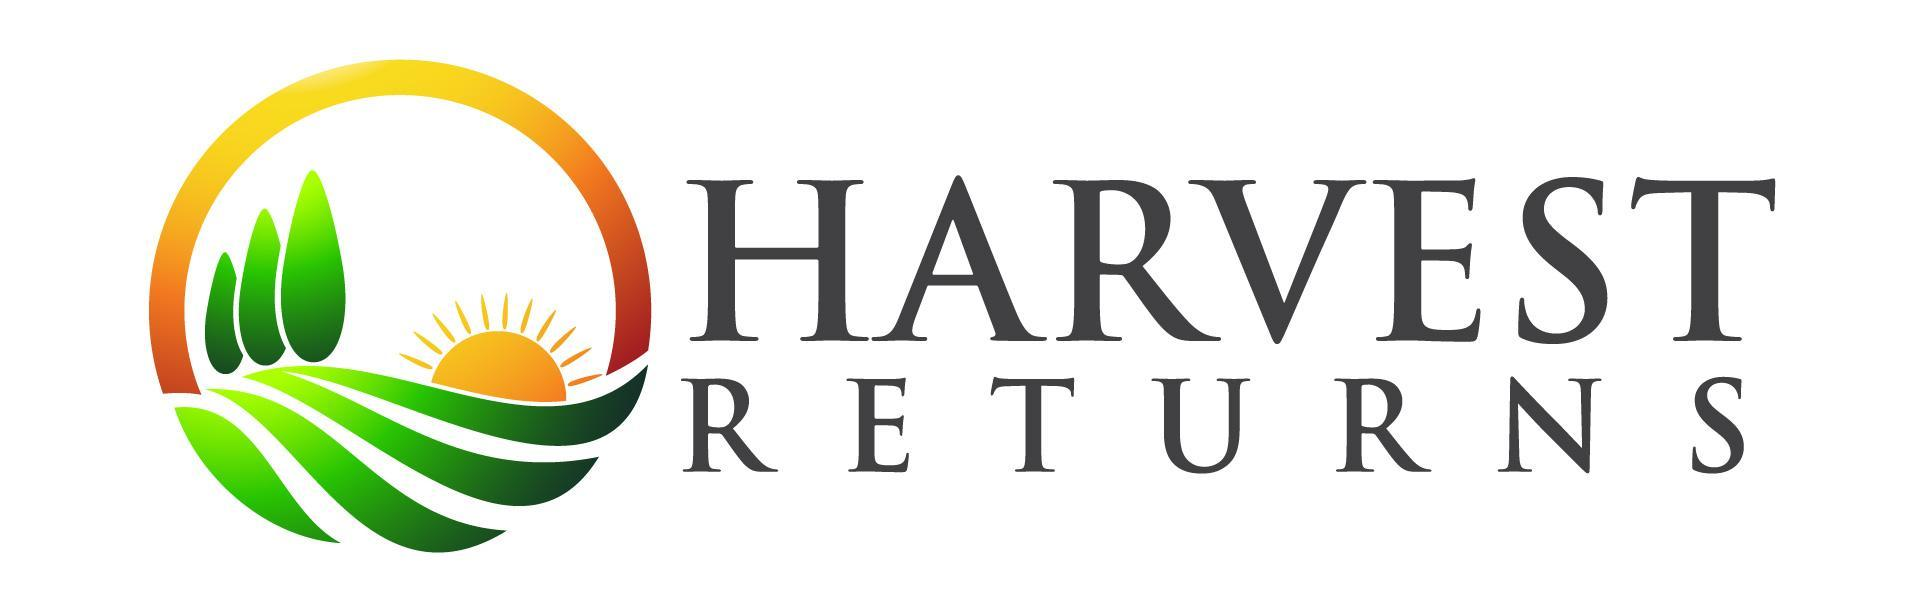 Harvest Returns company logo